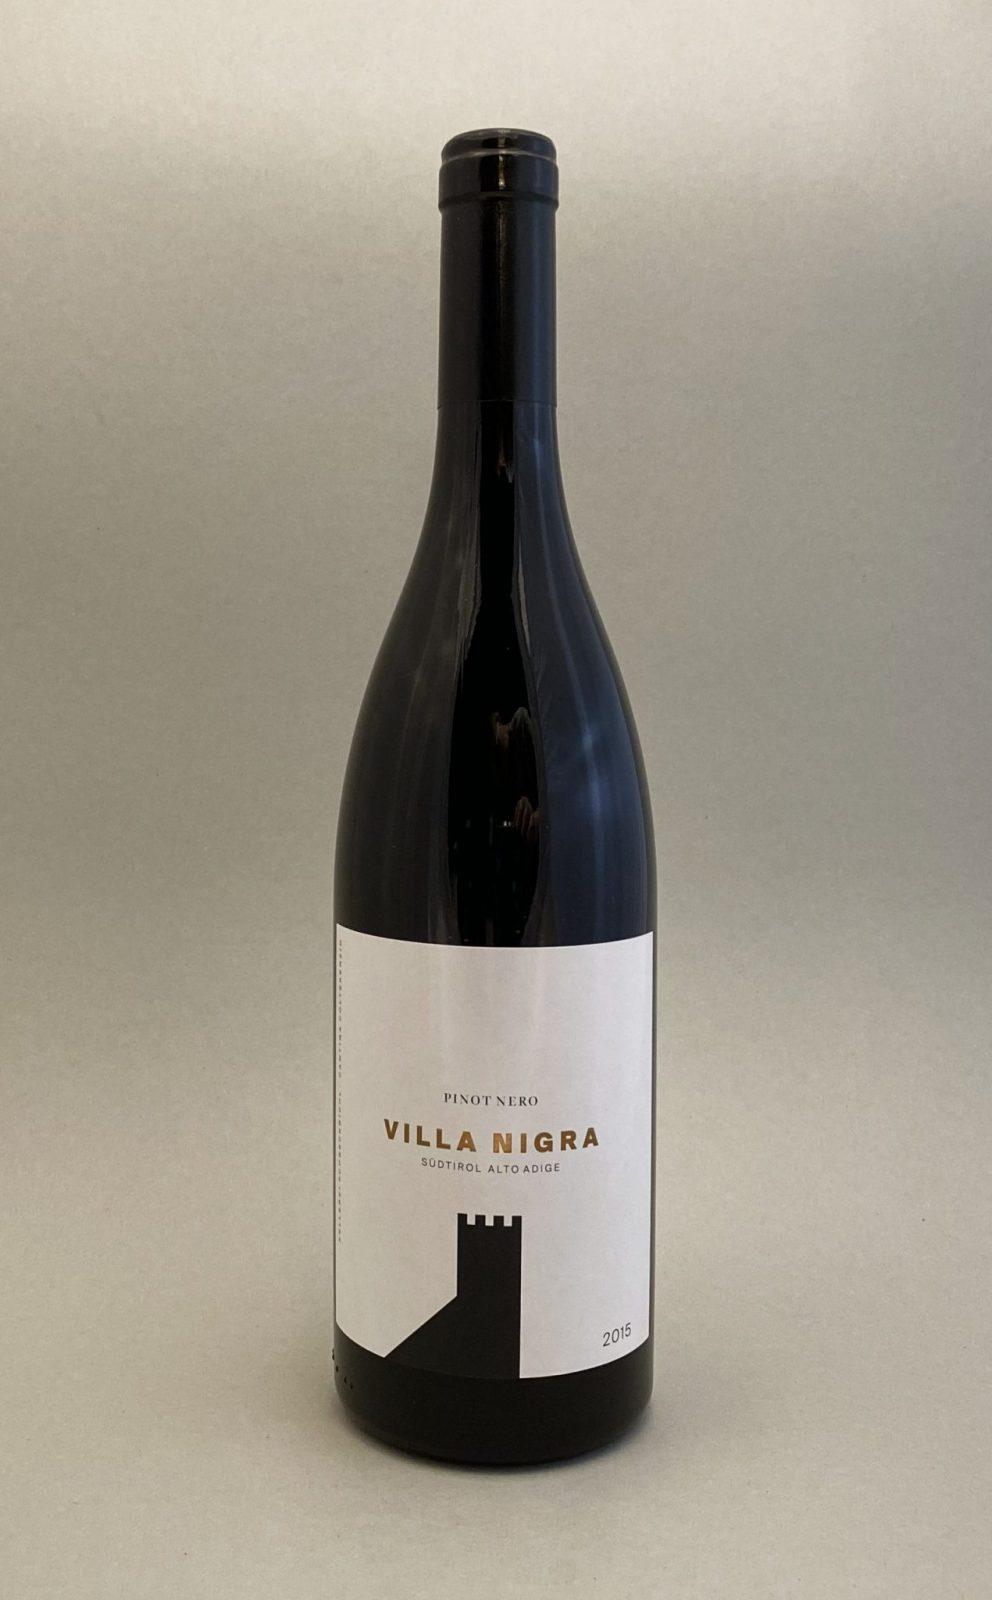 COLTERENZIO Villa Nigra Pinot Nero 2015, vinoteka Sunny wines slnecnice mesto, Bratislava petrzalka, vino červené z Talianska, rozvoz vín, eshop